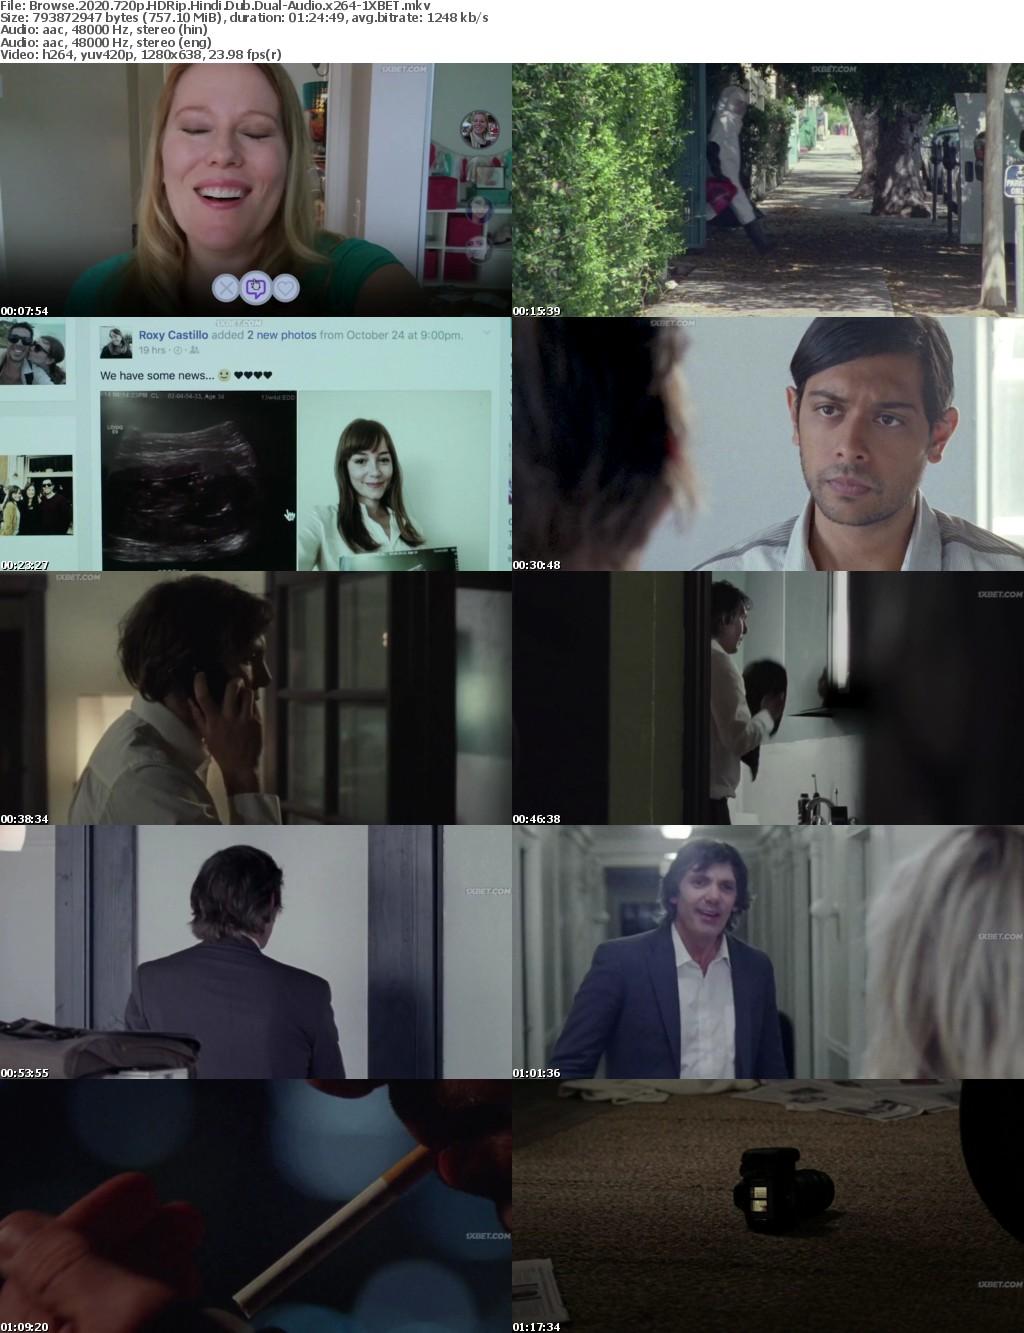 Browse (2020) 720p HDRip Hindi-Dub Dual-Audio x264 - 1XBET